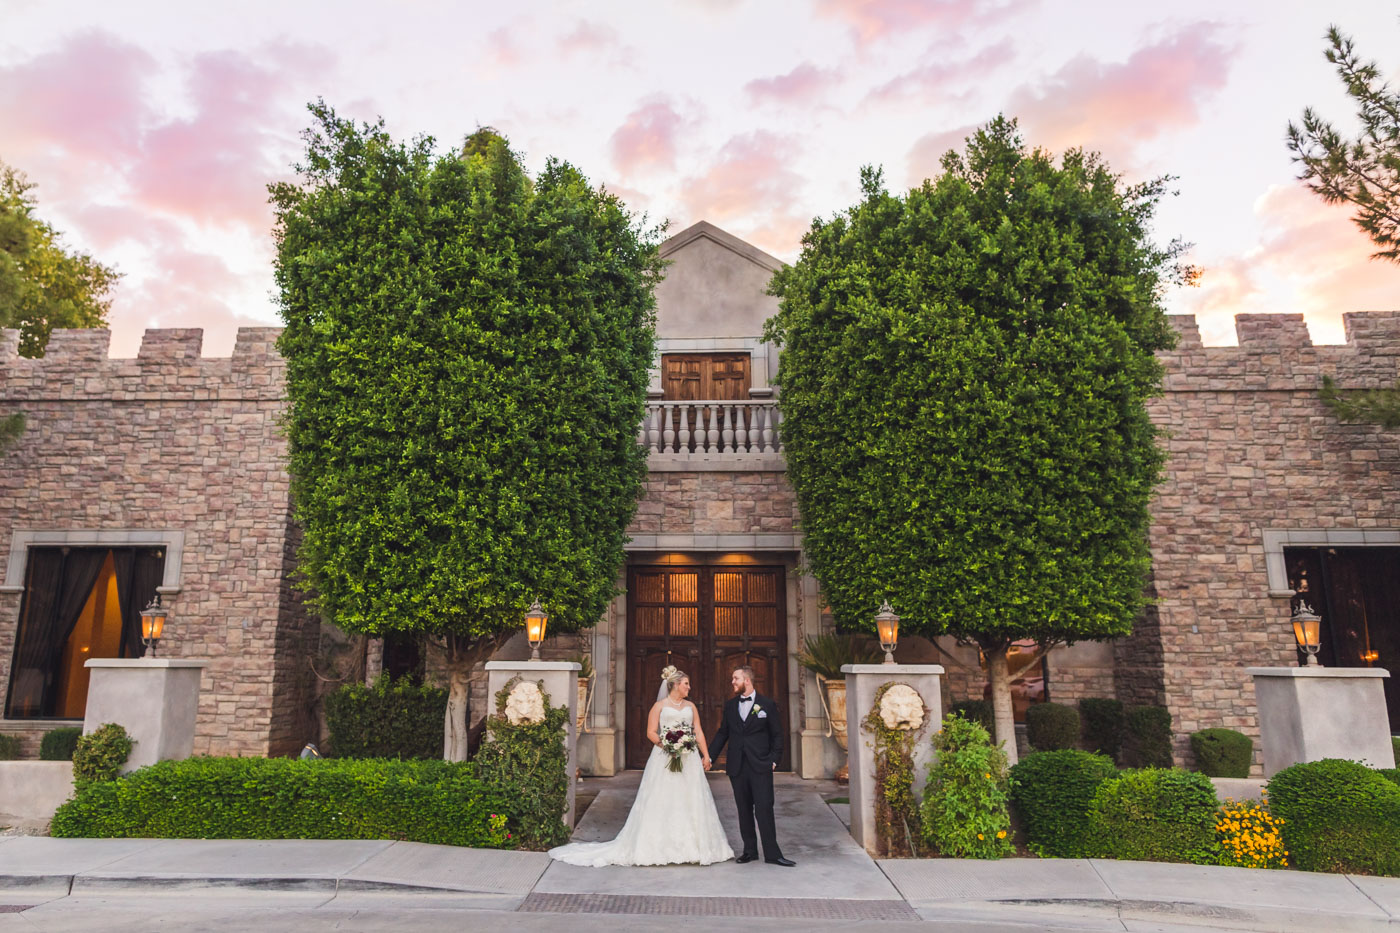 wedding-photos-at-the-ashley-castle